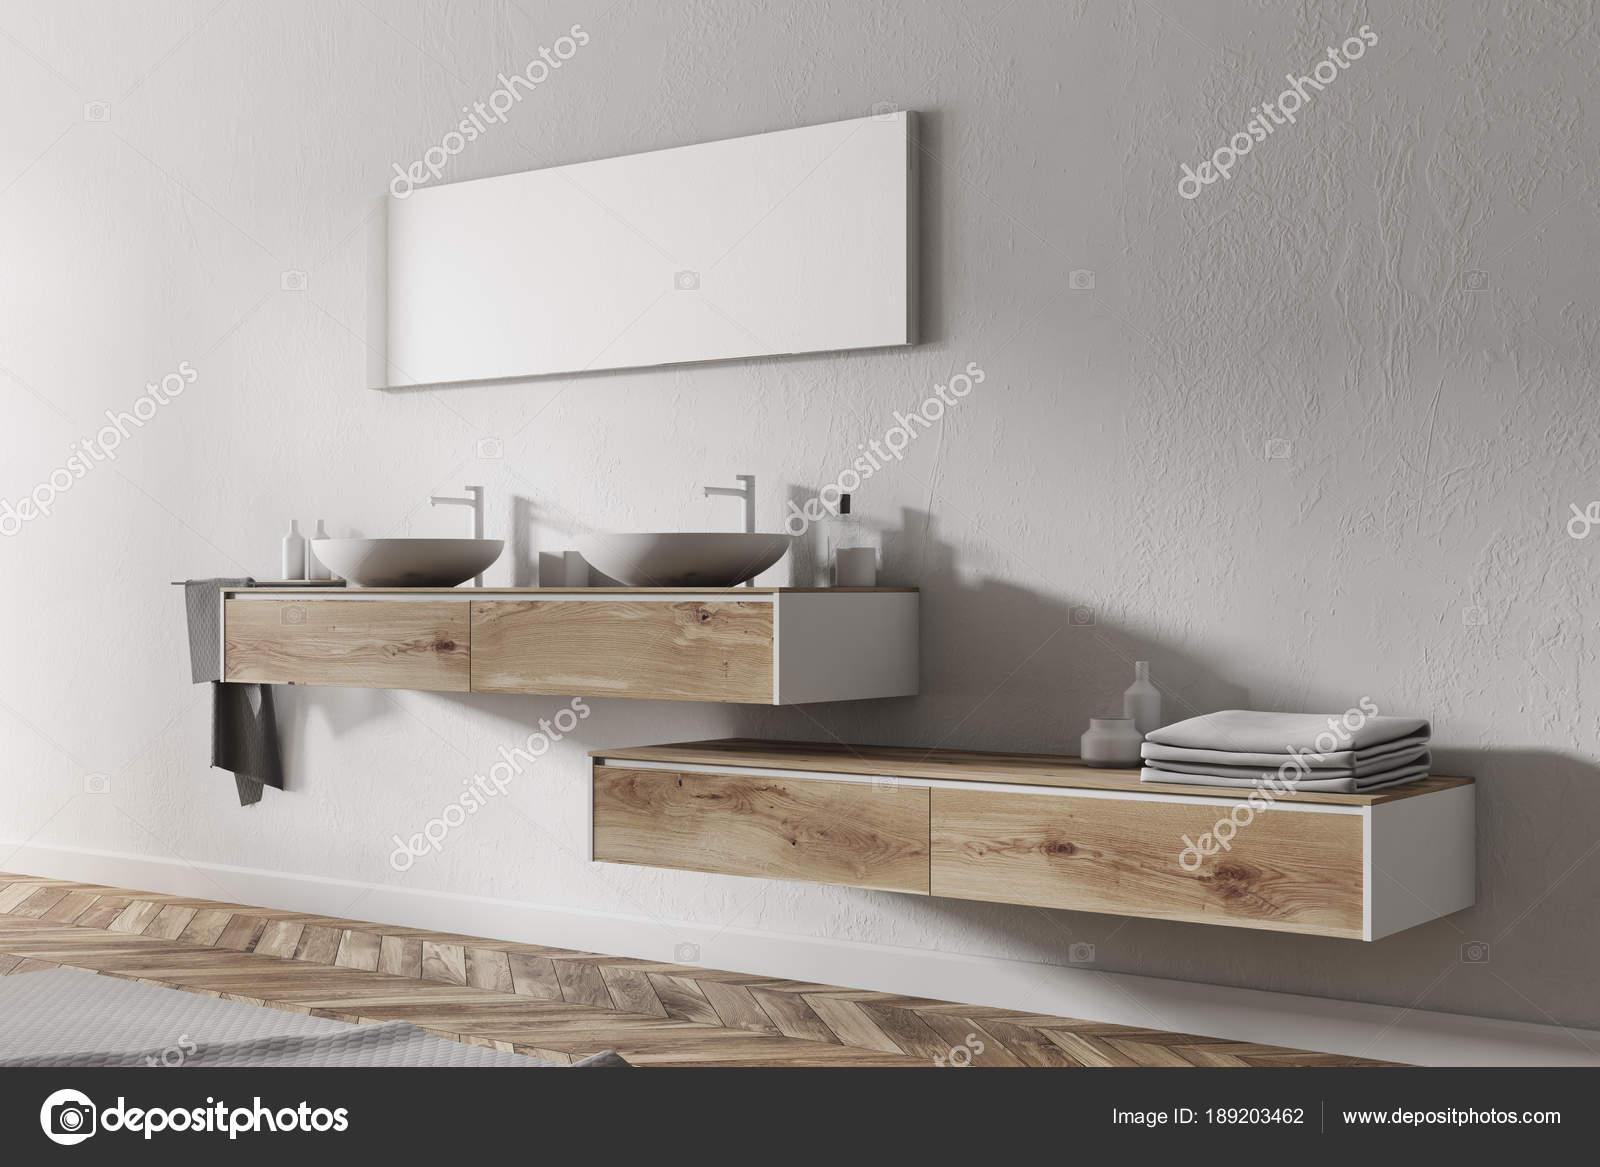 Hoek Wasbak Badkamer : Dubbele wastafel badkamer hoek u stockfoto denisismagilov